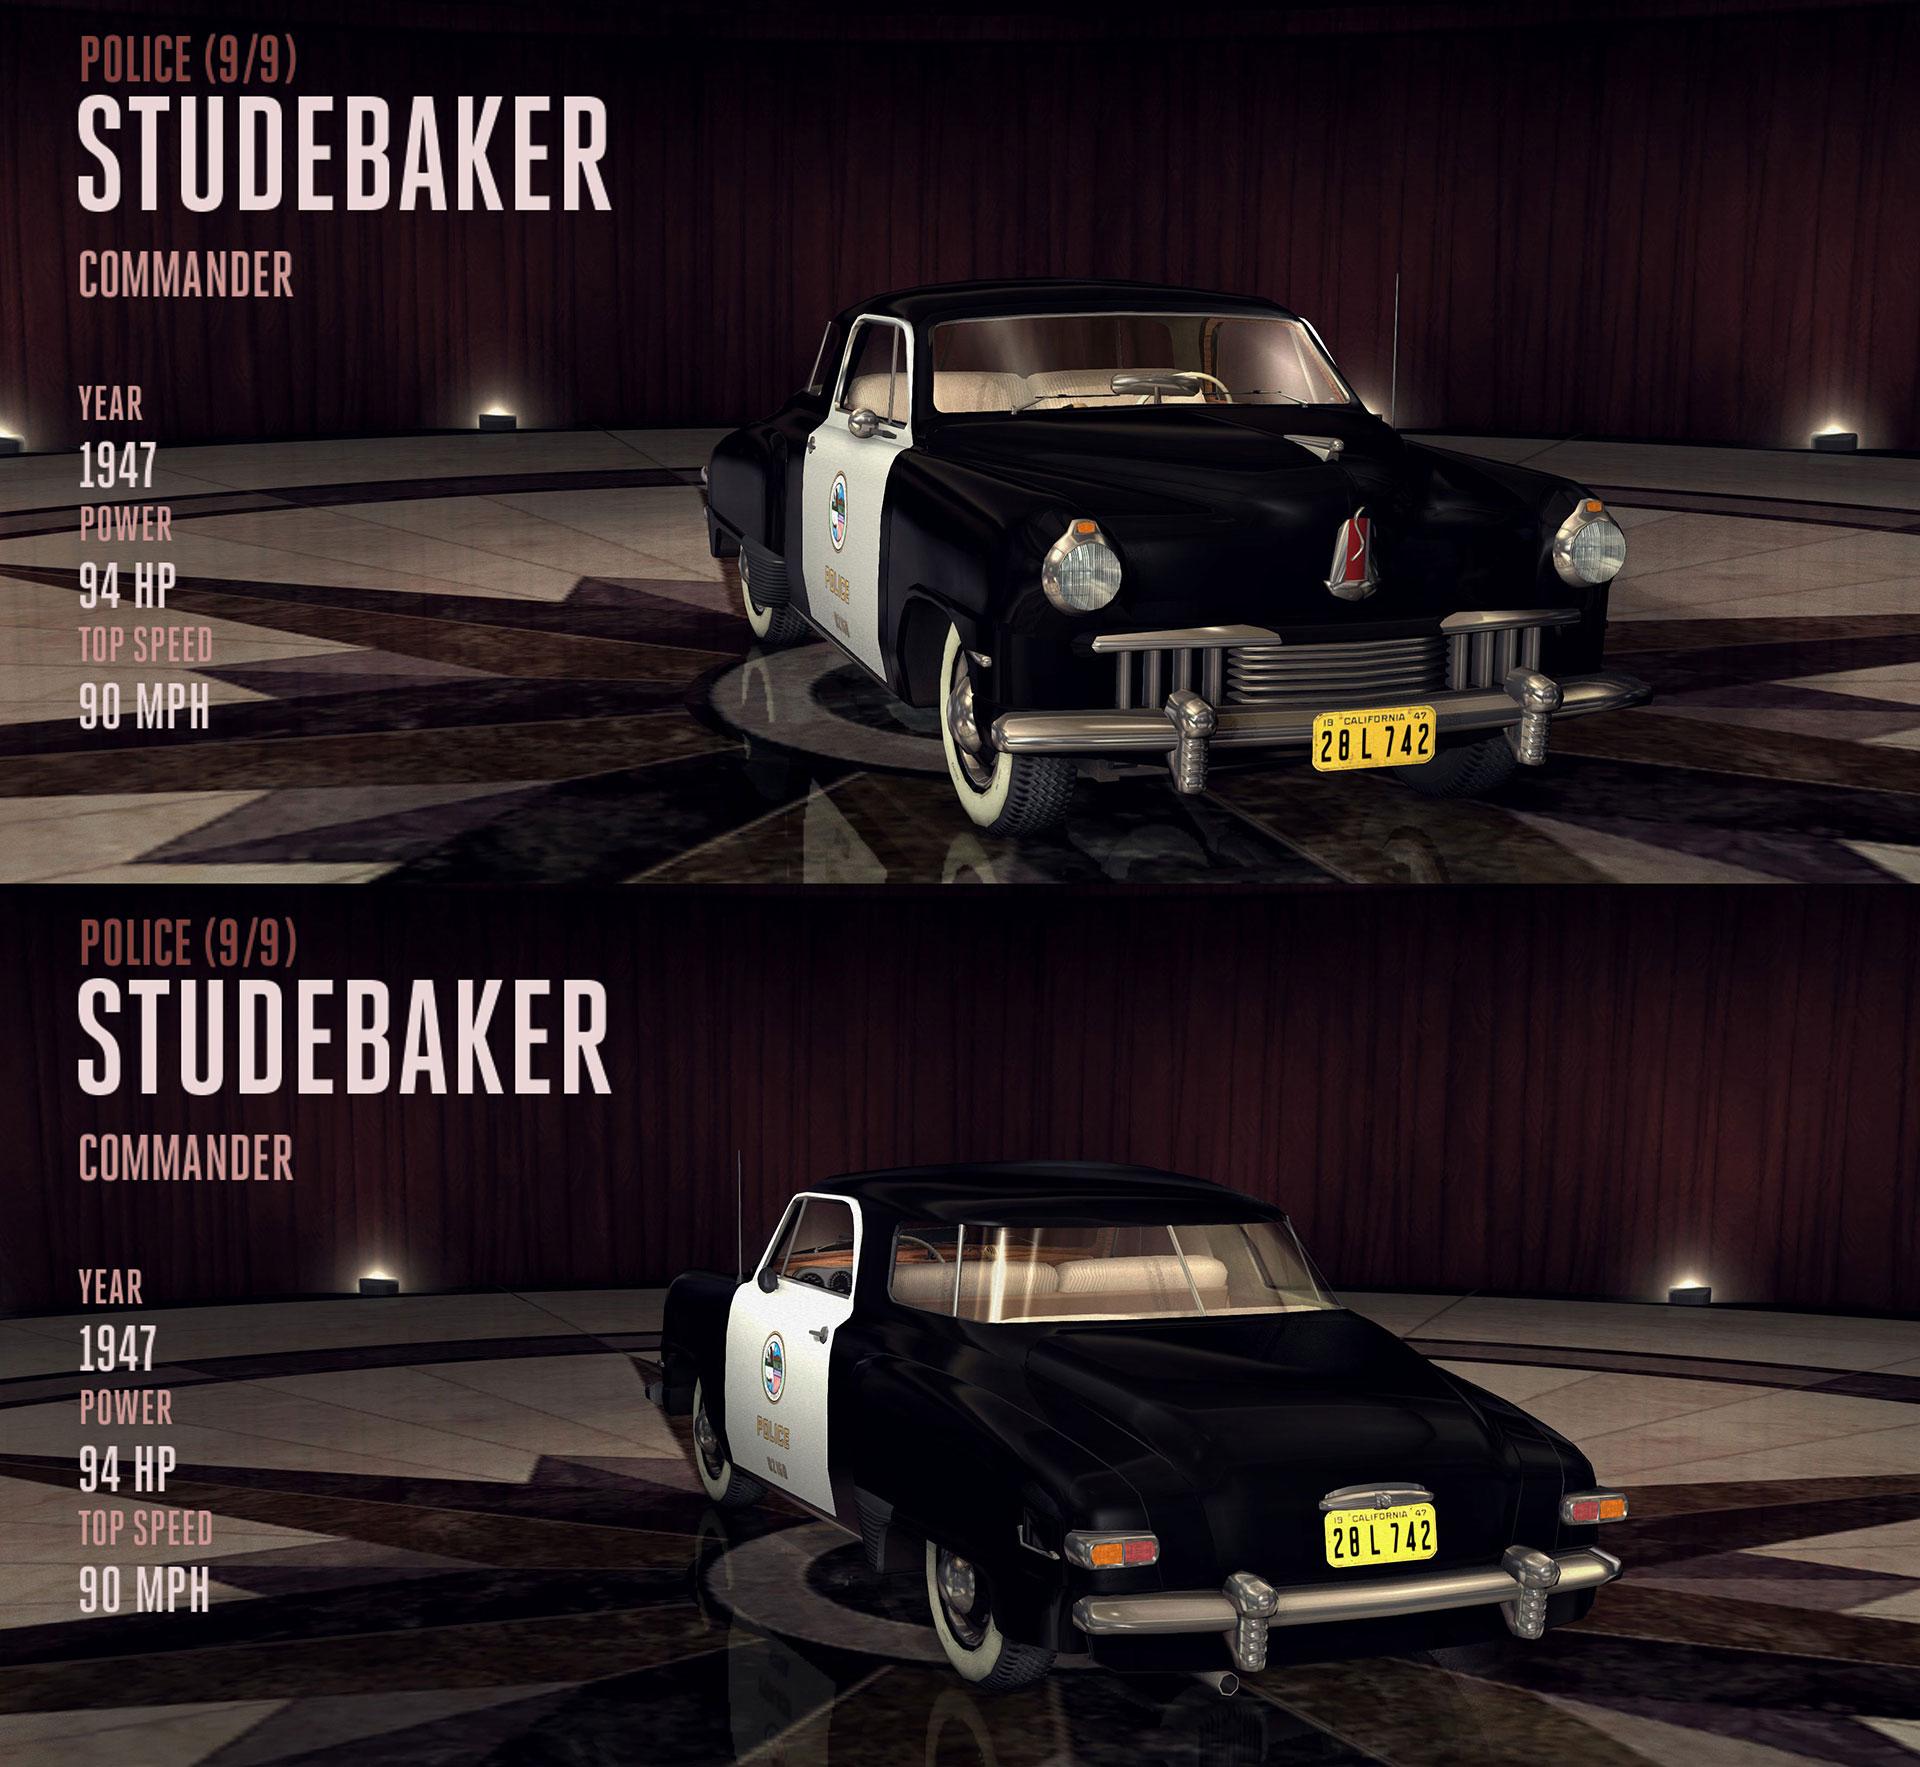 Archivo:1947-studebaker-commander.jpg